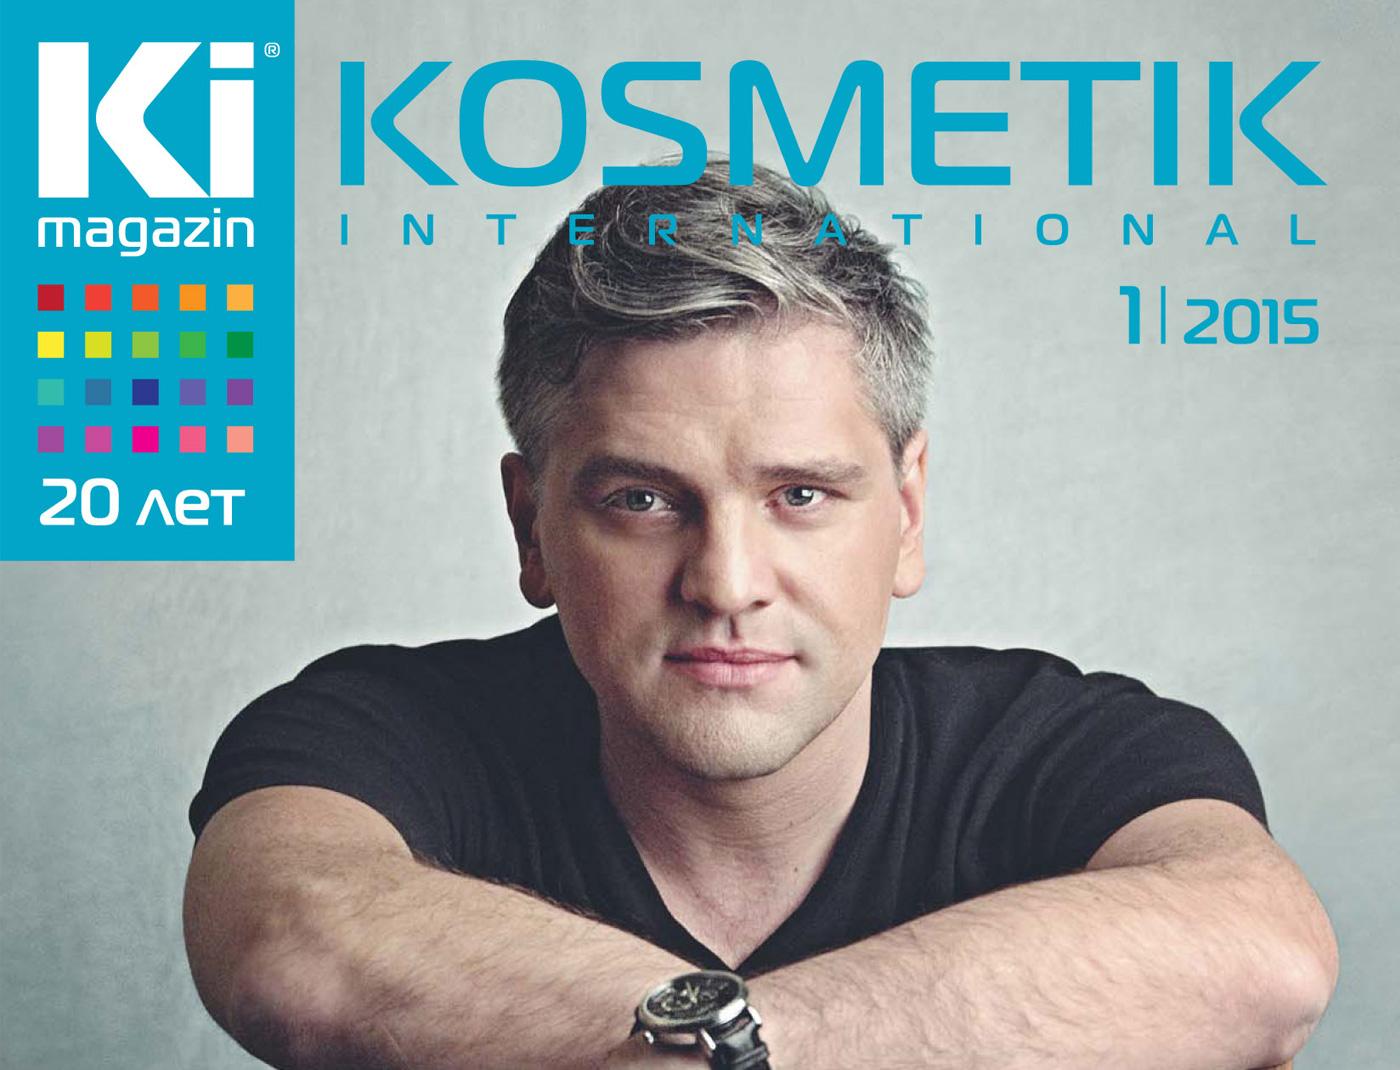 Kosmetik international (Выпуск 1/2015)